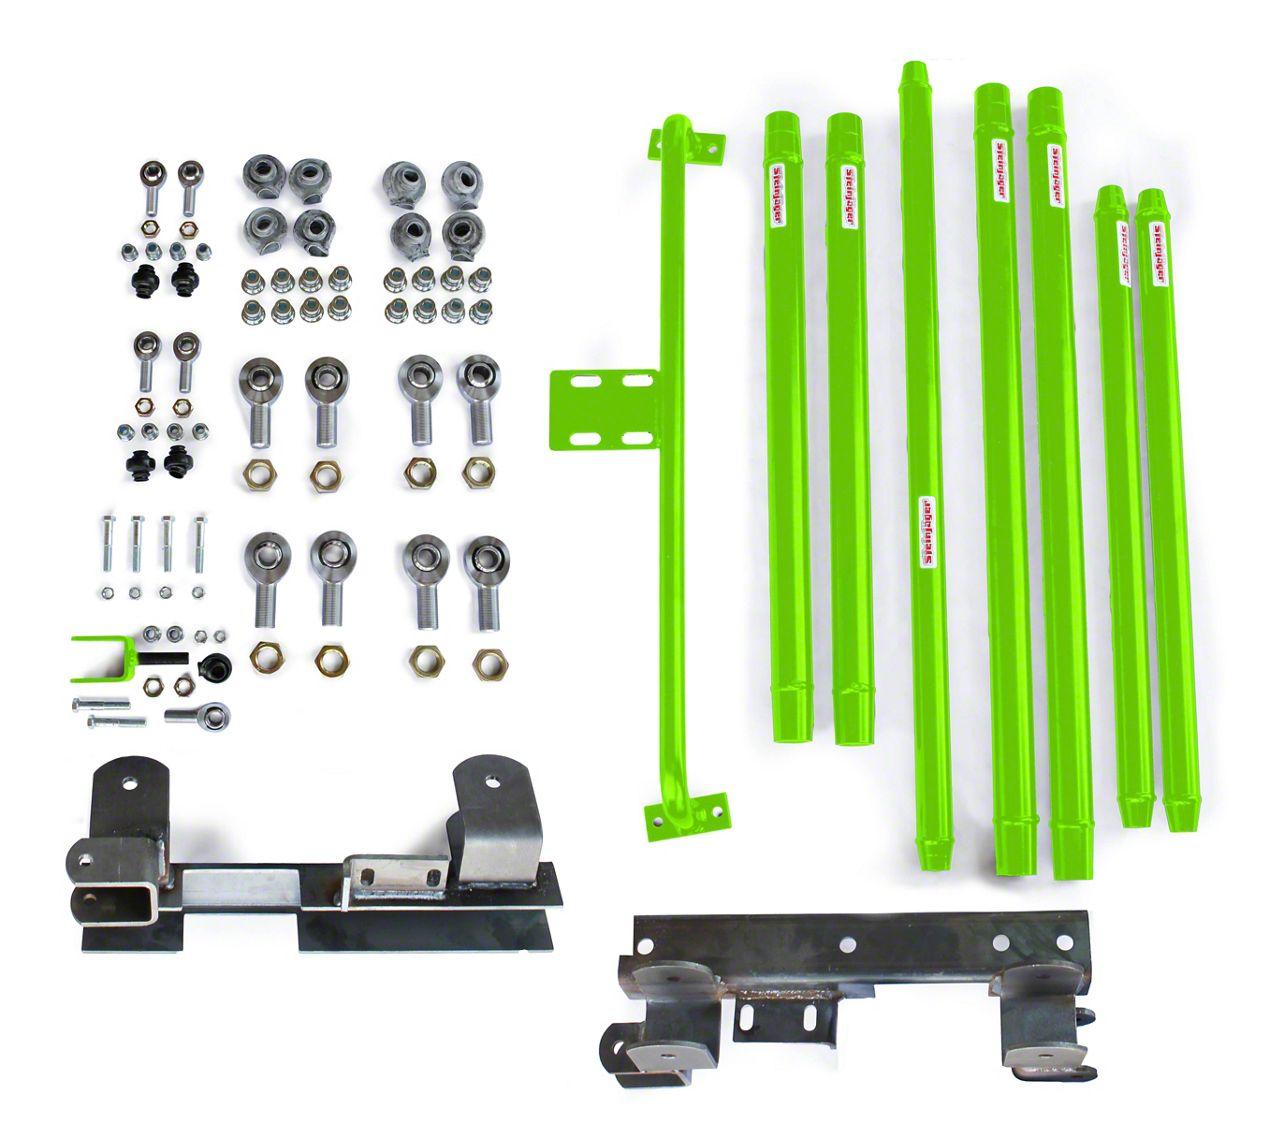 Steinjager DOM Tube Long Arm Travel kit for 2-6 in. Lift - Neon Green (97-06 Jeep Wrangler TJ)